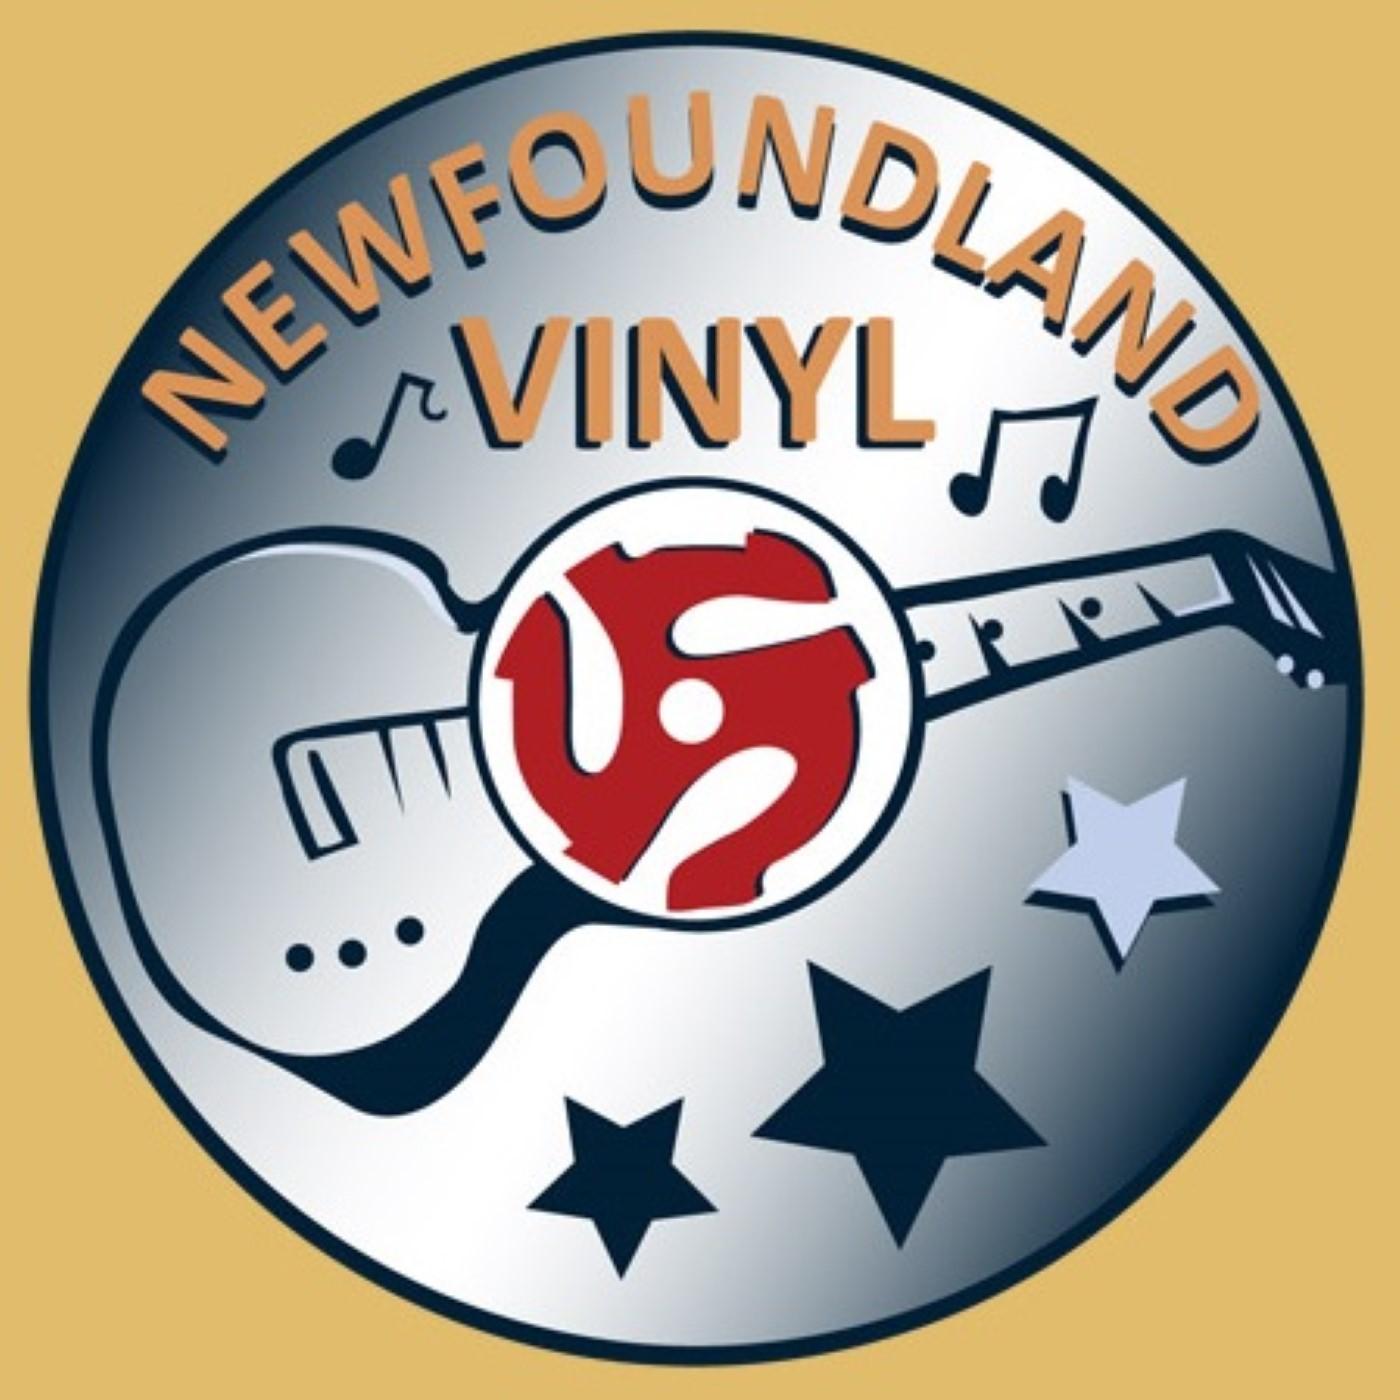 Newfoundland Vinyl - logo by Ed Hollet